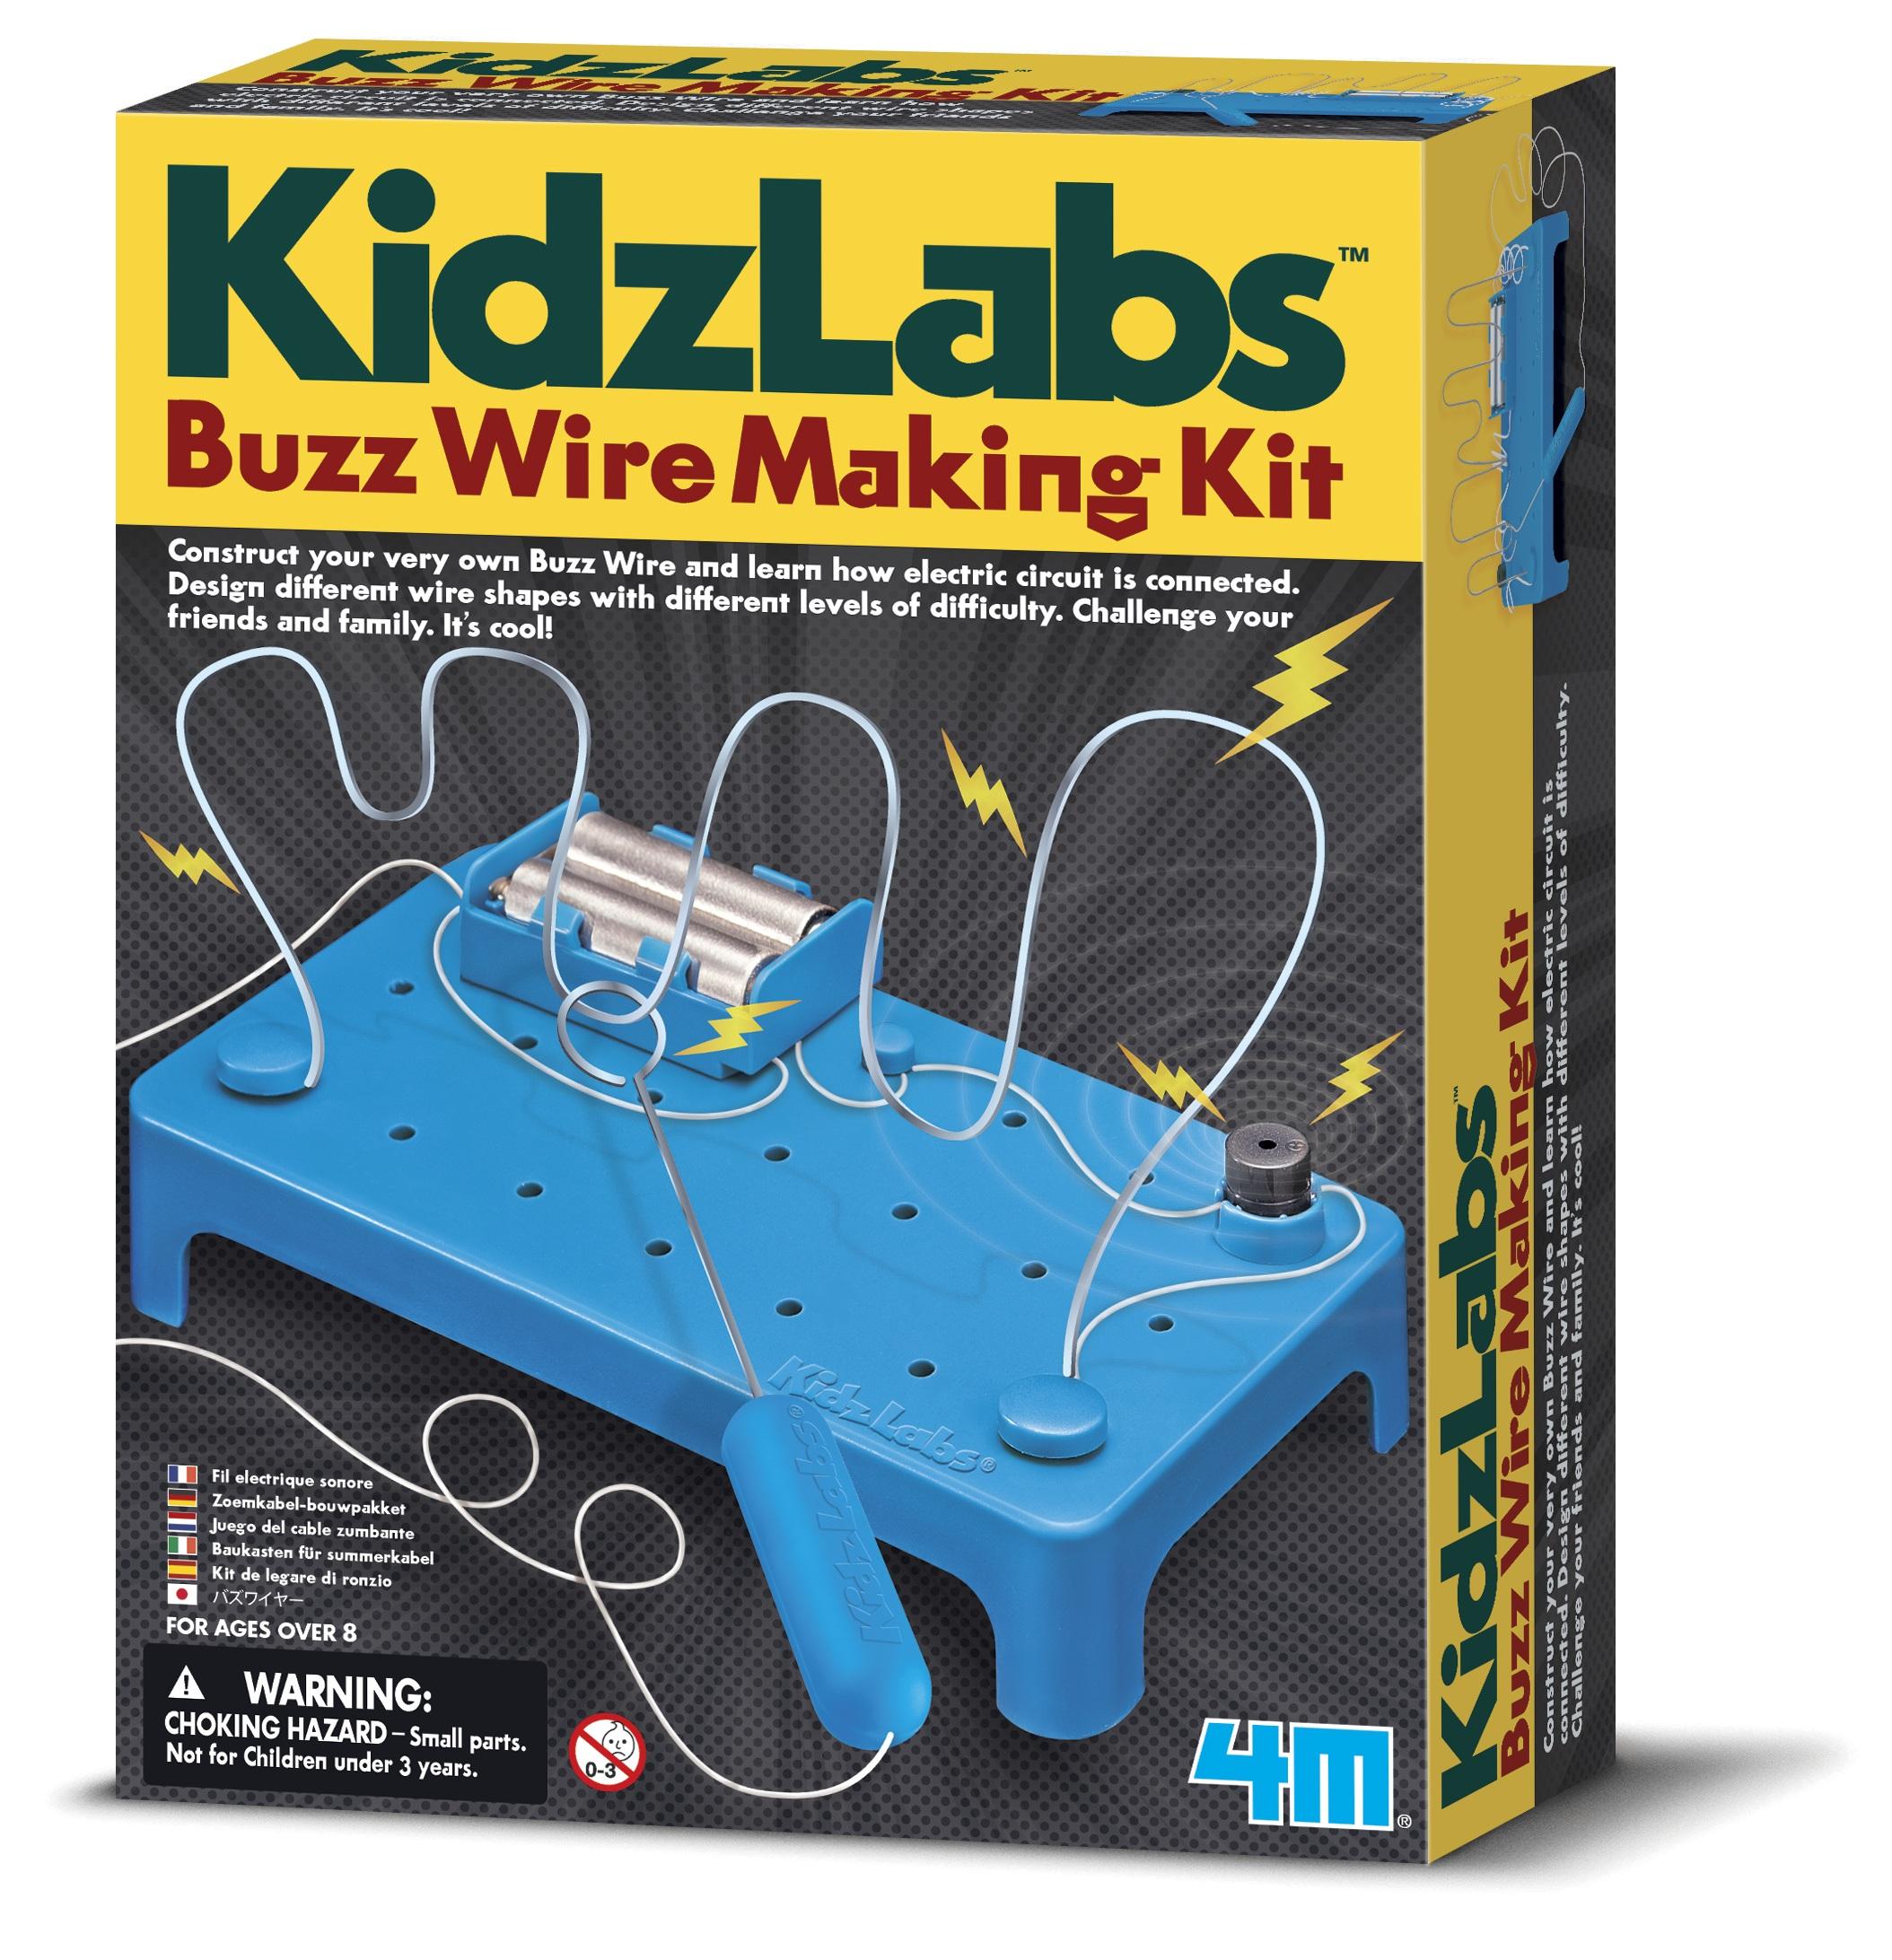 KidzLabs Buzz Wire Making Kit